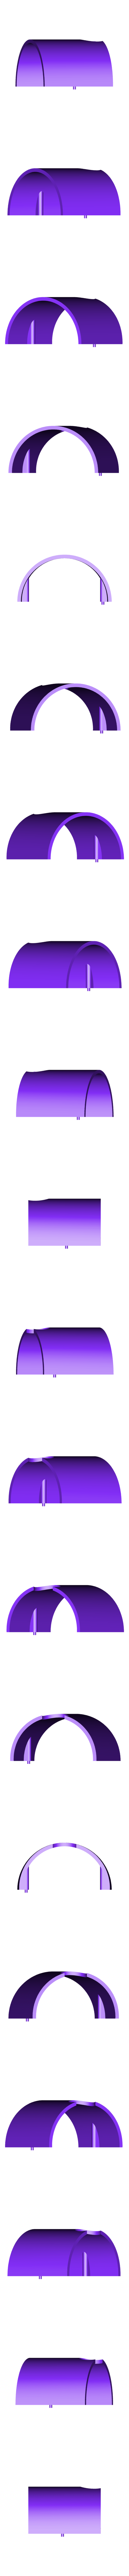 Smoke_Box_-_Part_4-.STL Download free STL file 4-8-8-4 Big Boy Locomotive • 3D printer object, RaymondDeLuca